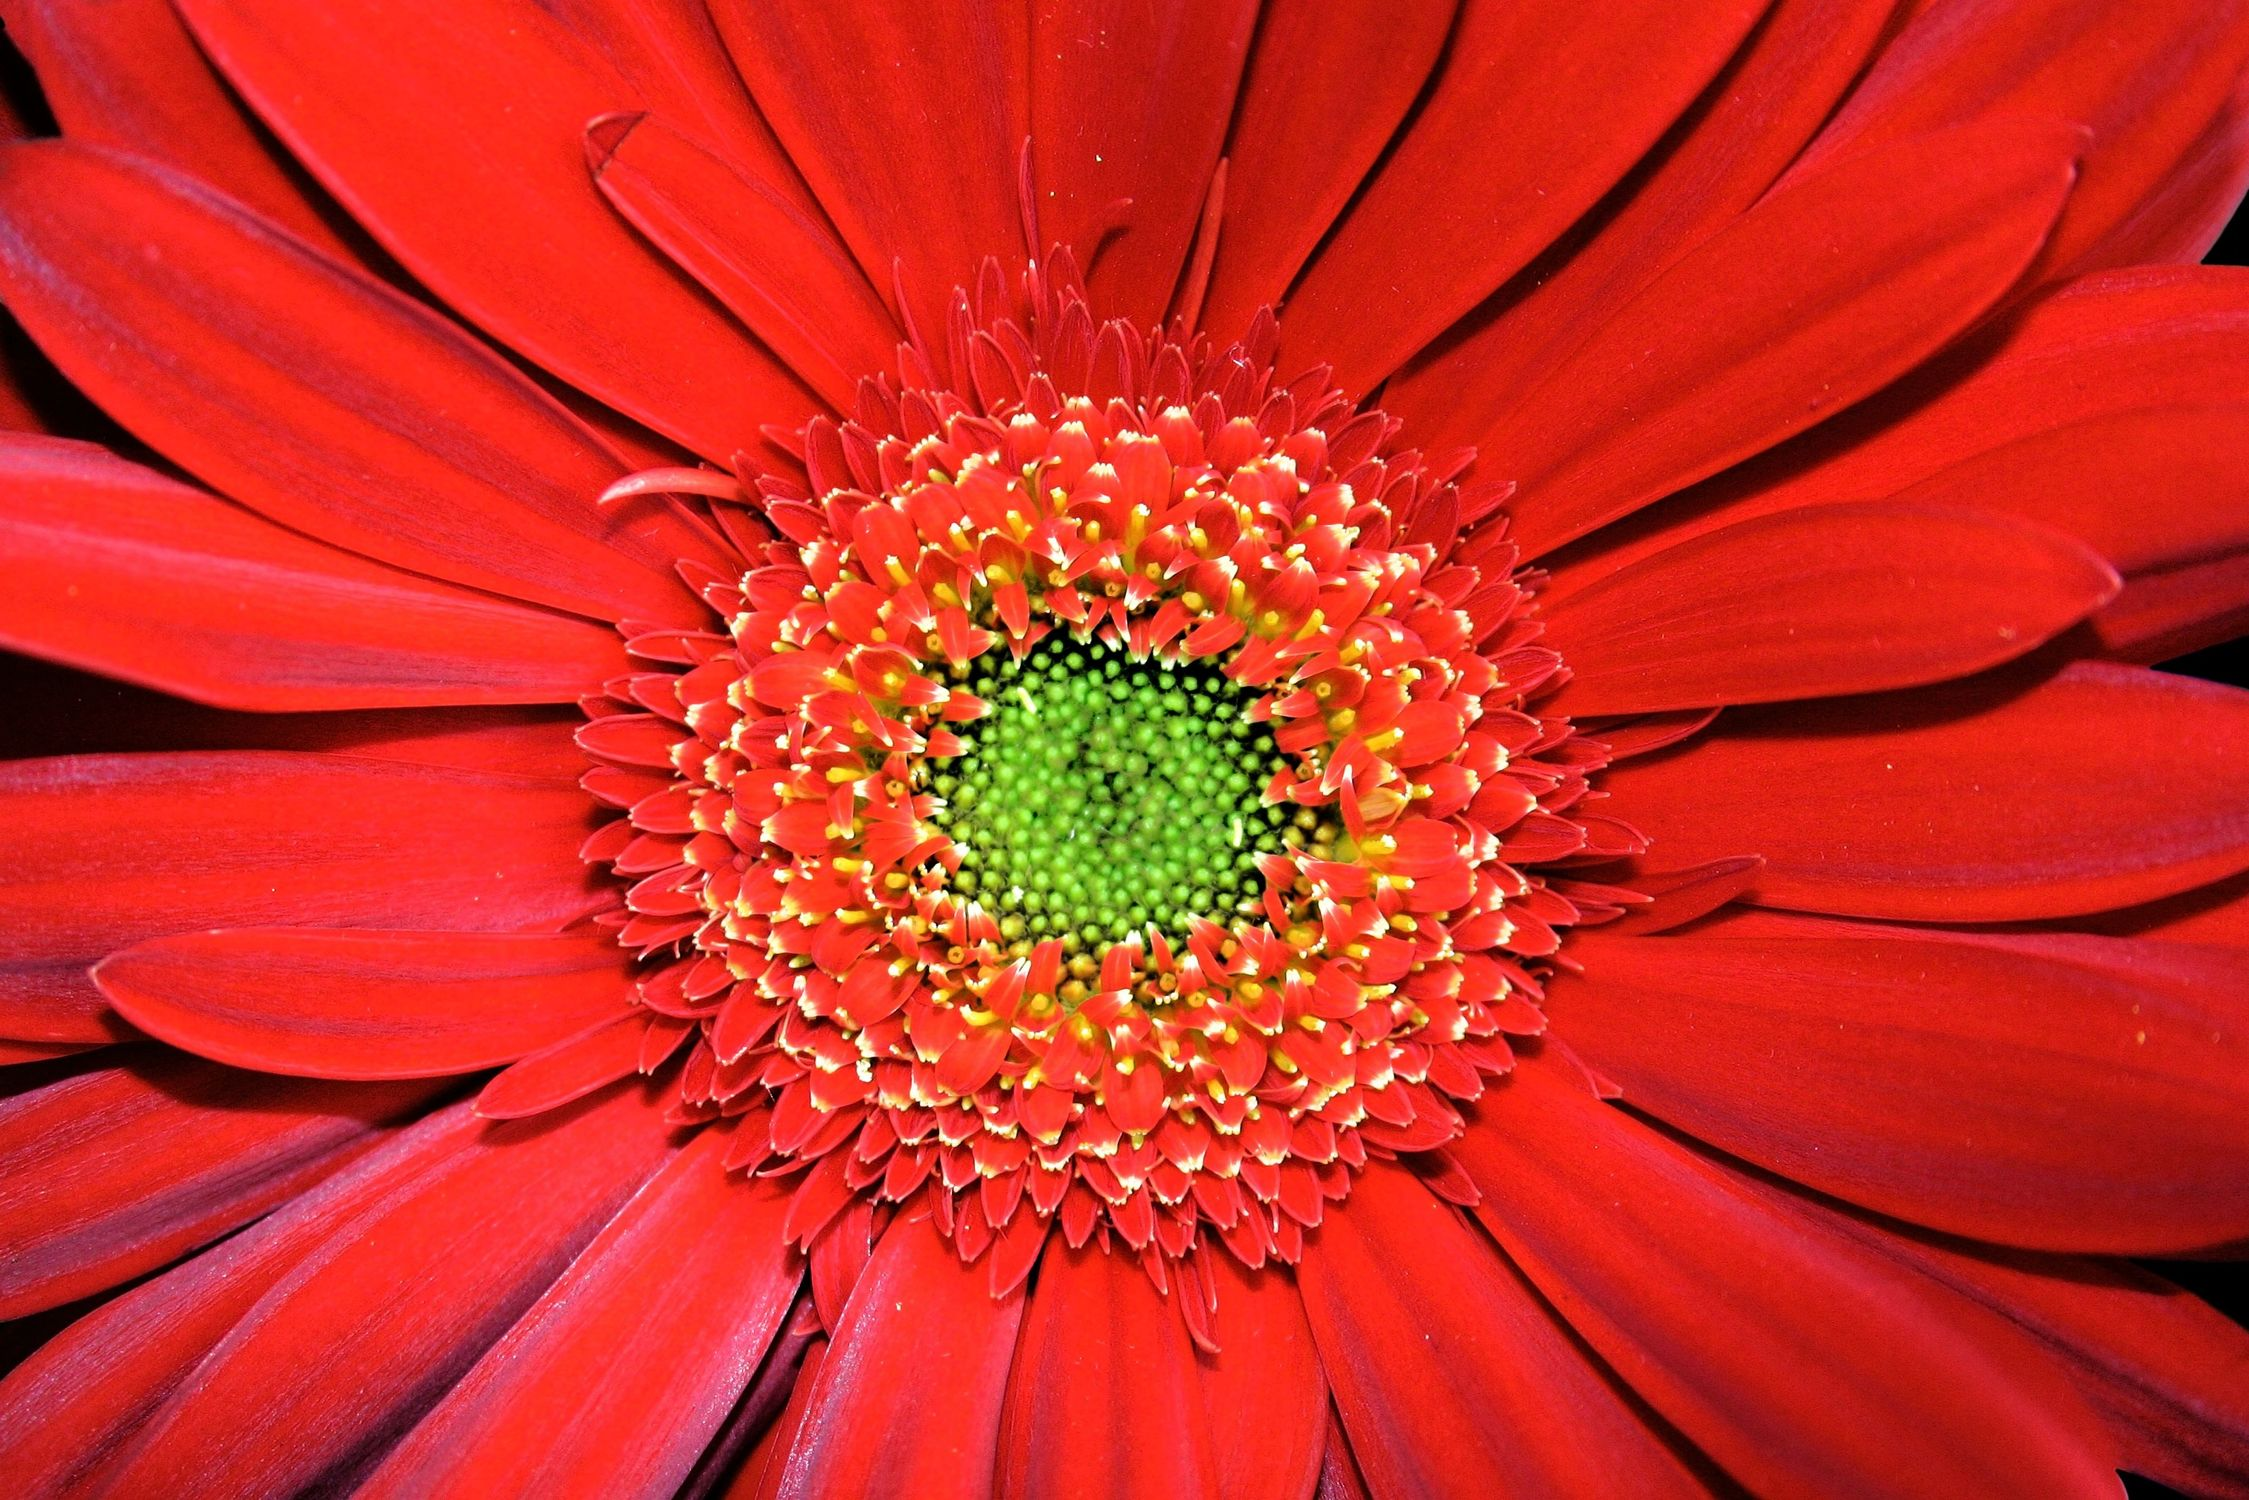 Bild mit Natur, Pflanzen, Blumen, Korbblütler, Gerberas, Blume, Pflanze